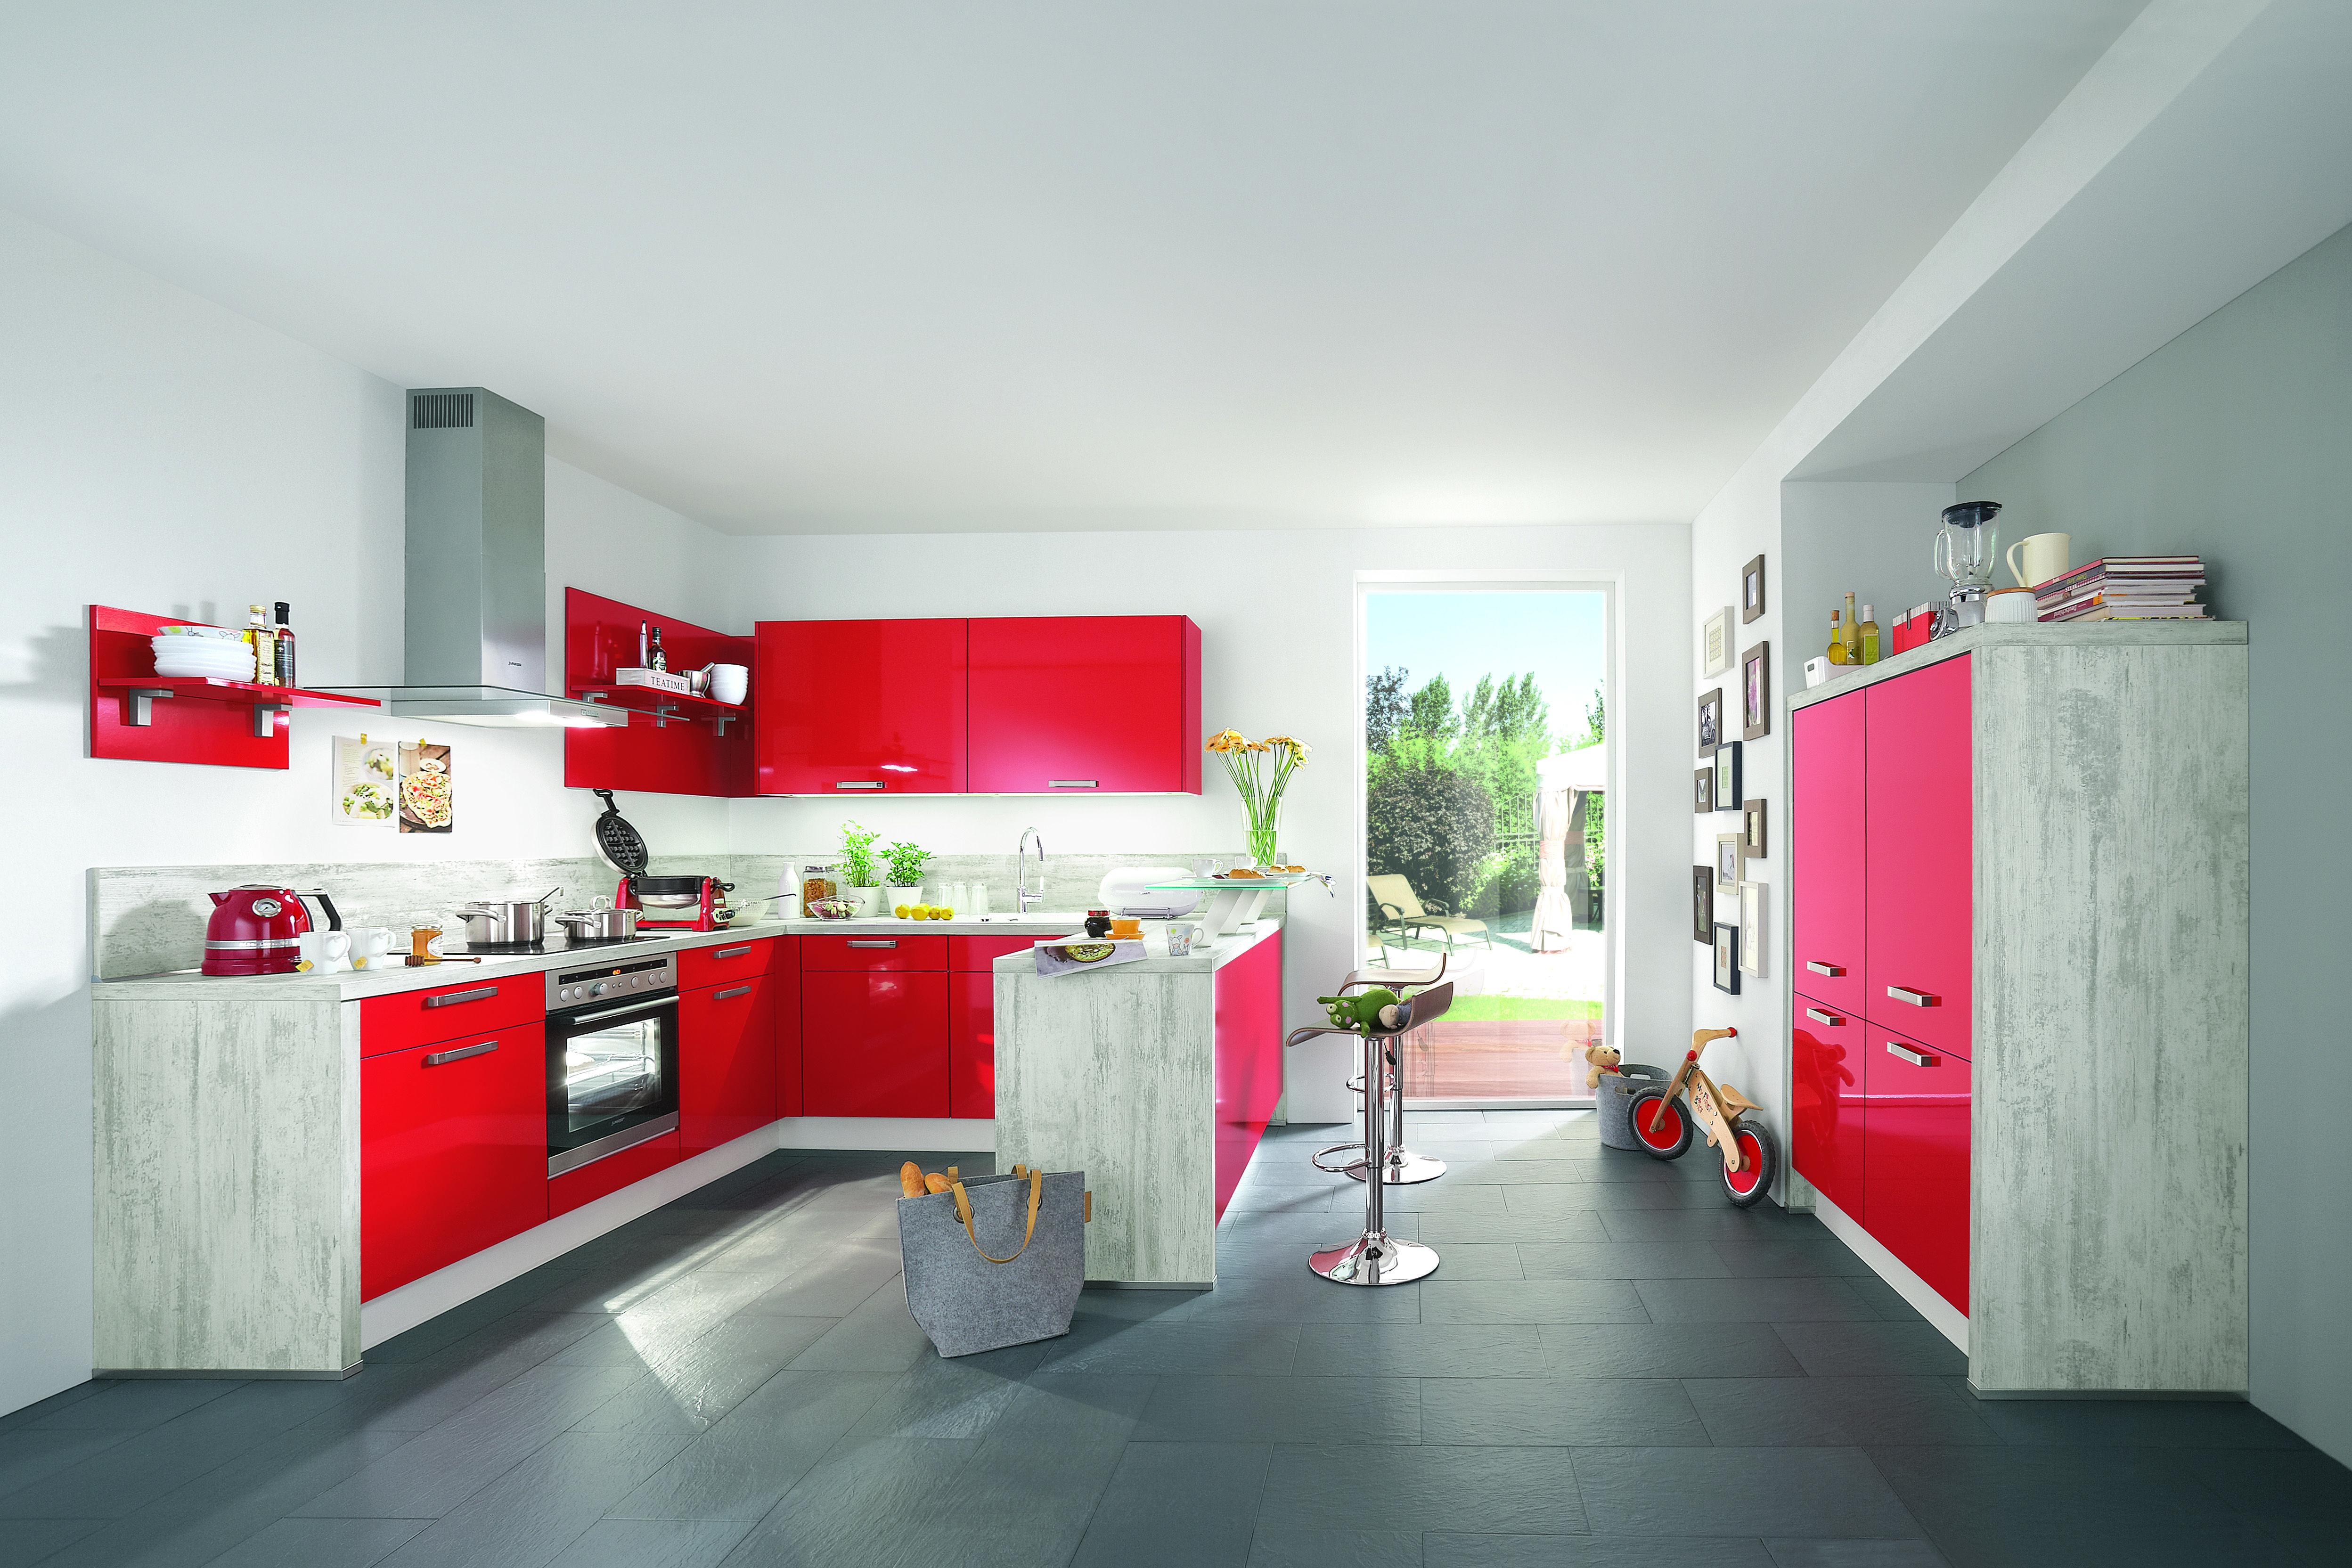 Keuken I Rood I   Keuken / interieur ideeën   Pinterest